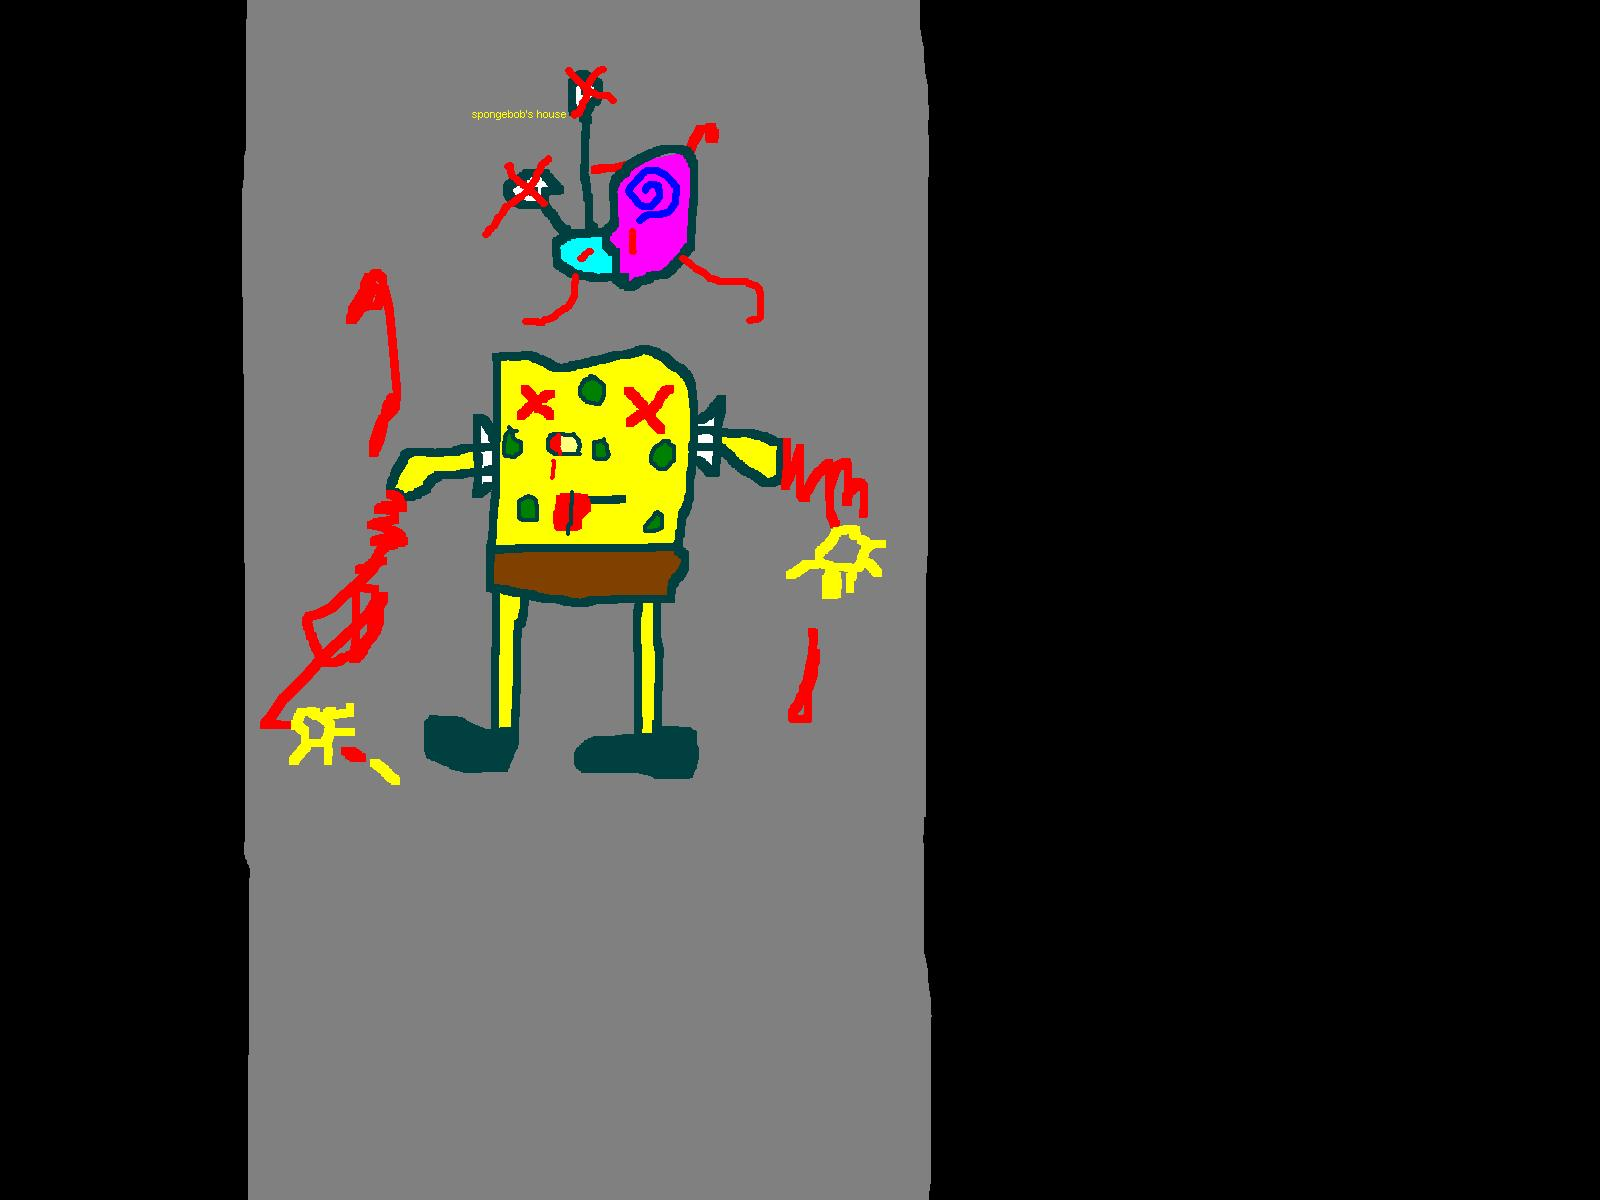 spongebob is dead oh nooooooo  by rojet58 on newgrounds